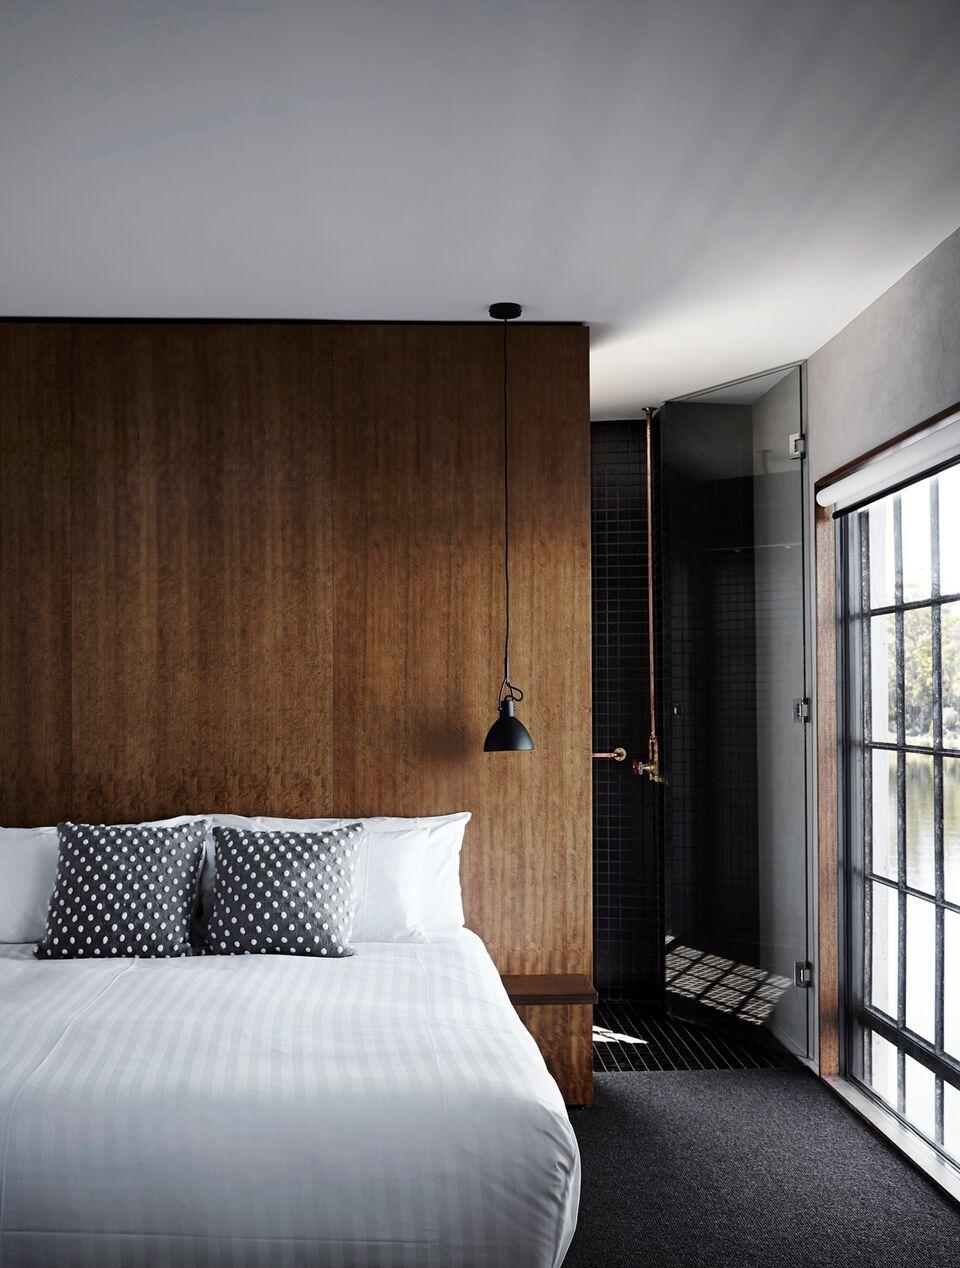 Local Australian Architecture Pumphouse Point Designed By Cumulus Studio 28